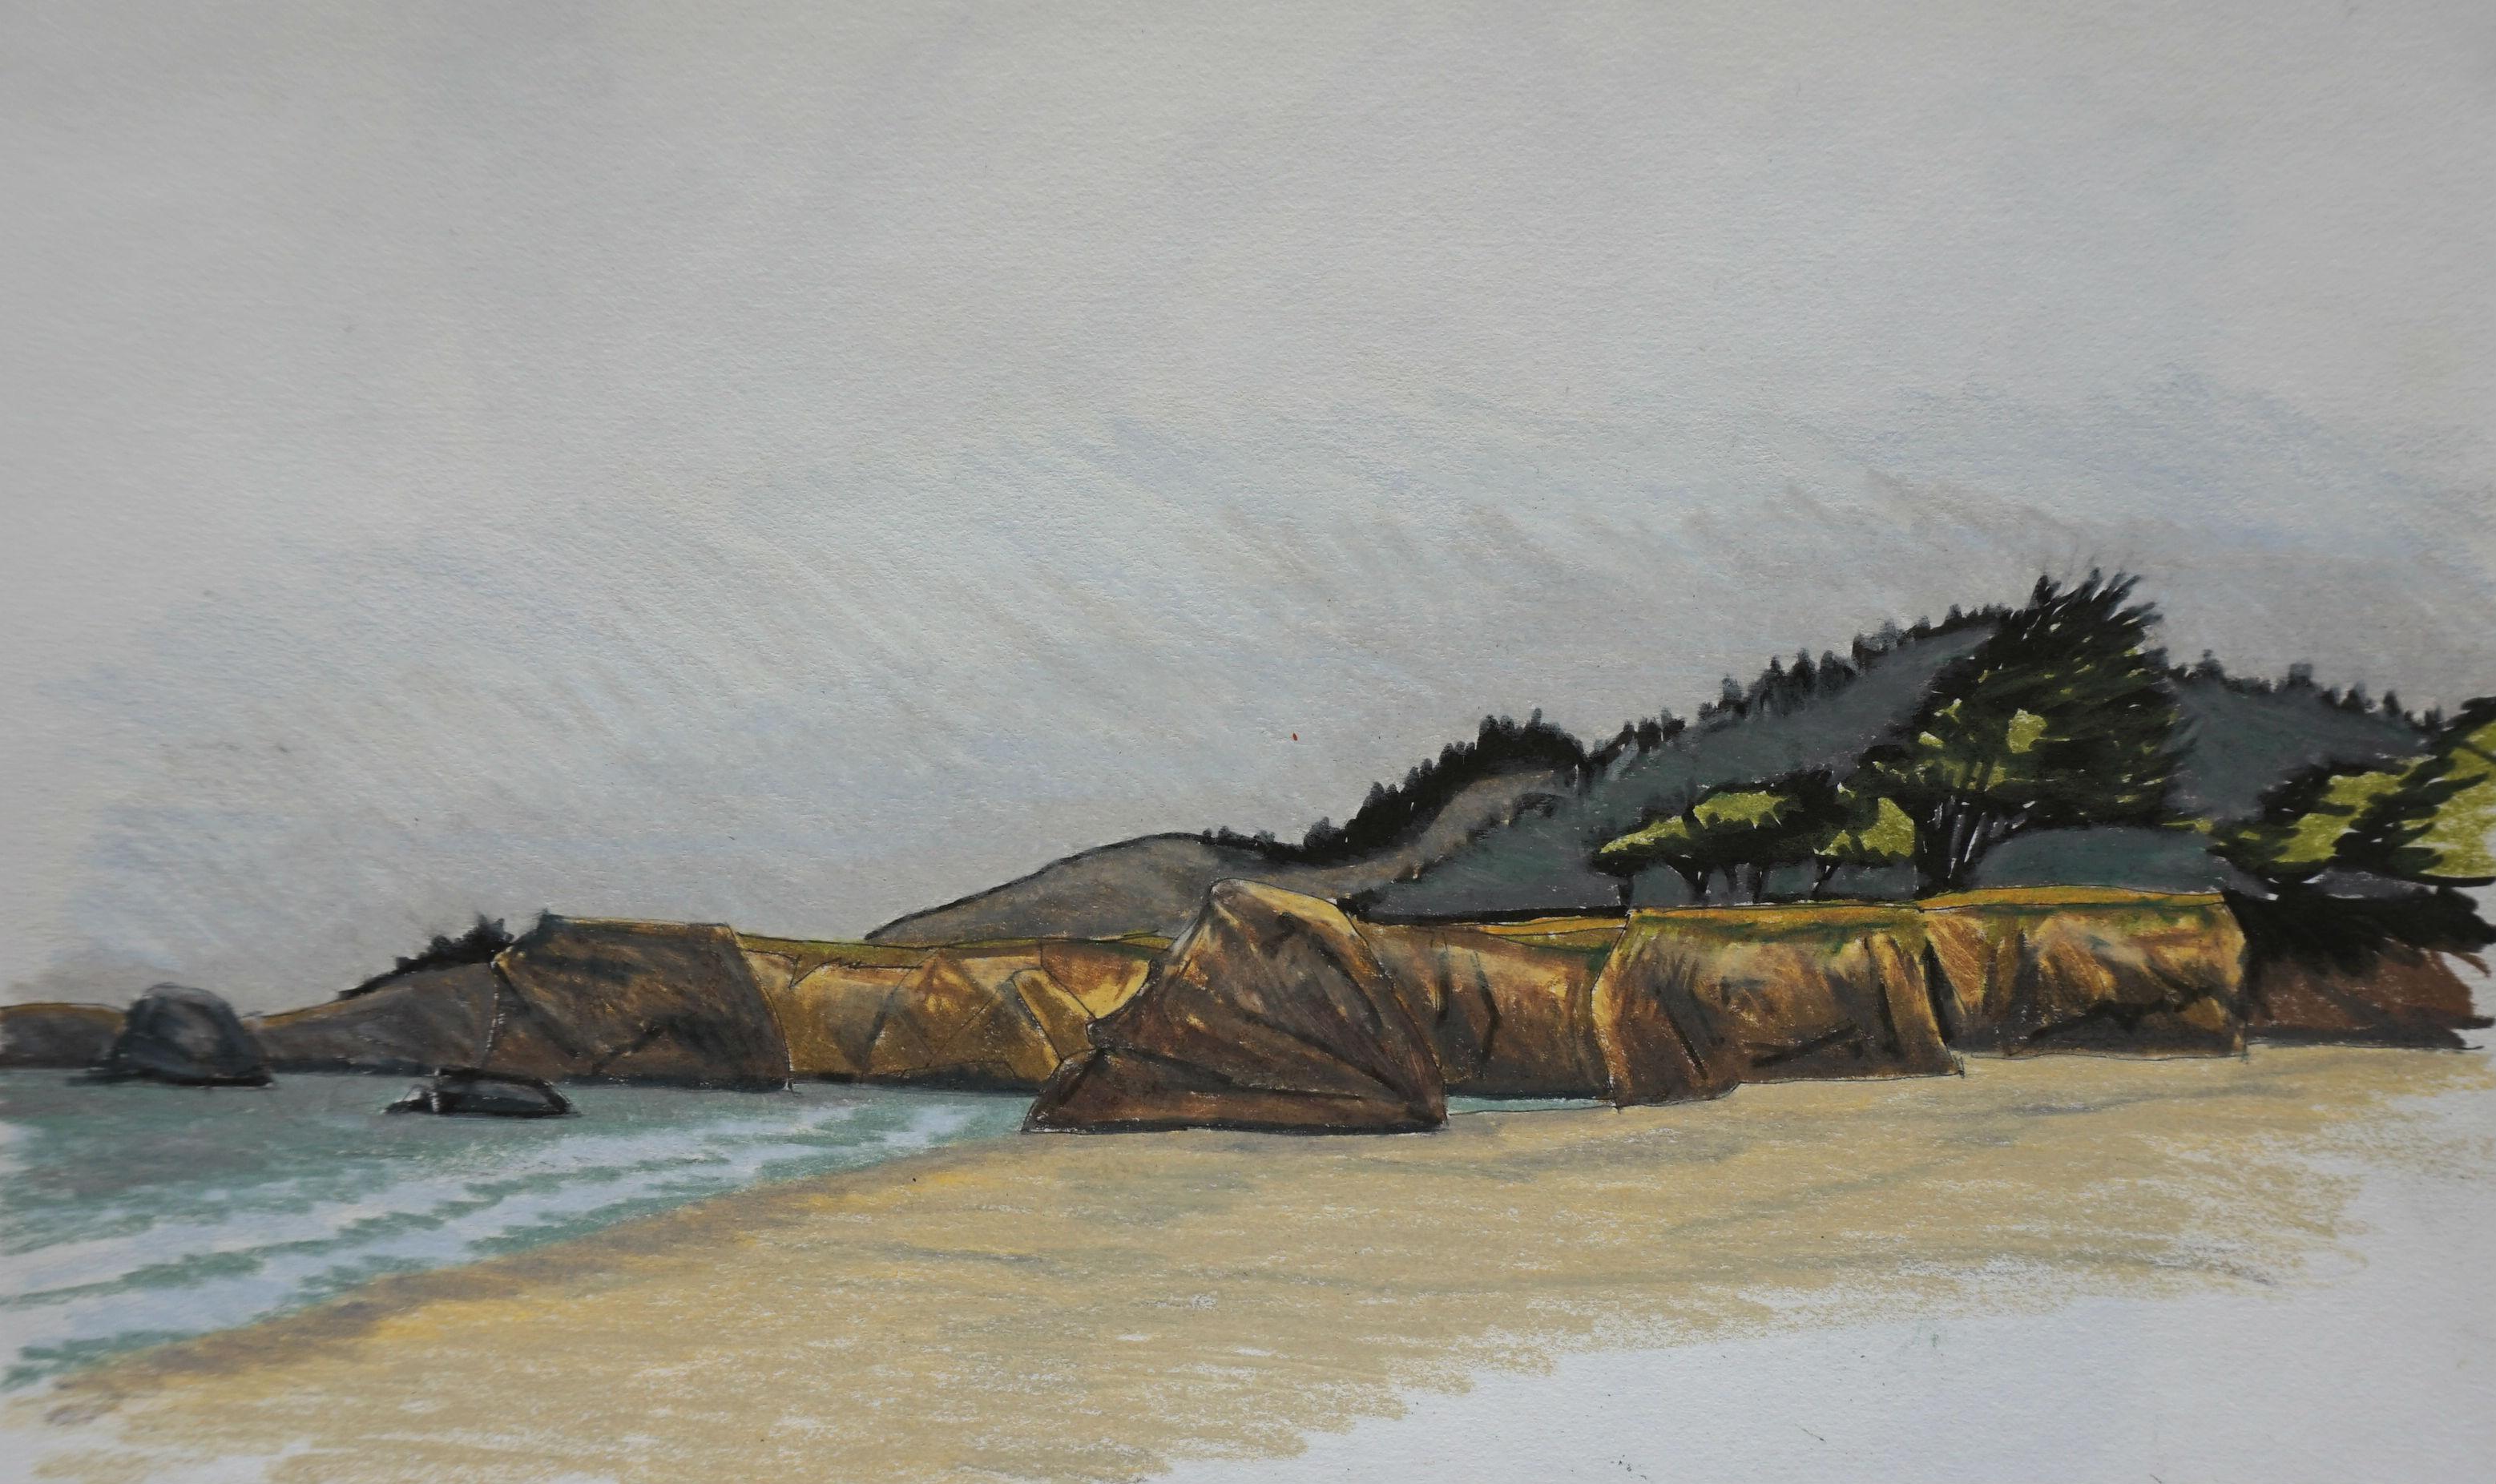 Northern CA coast